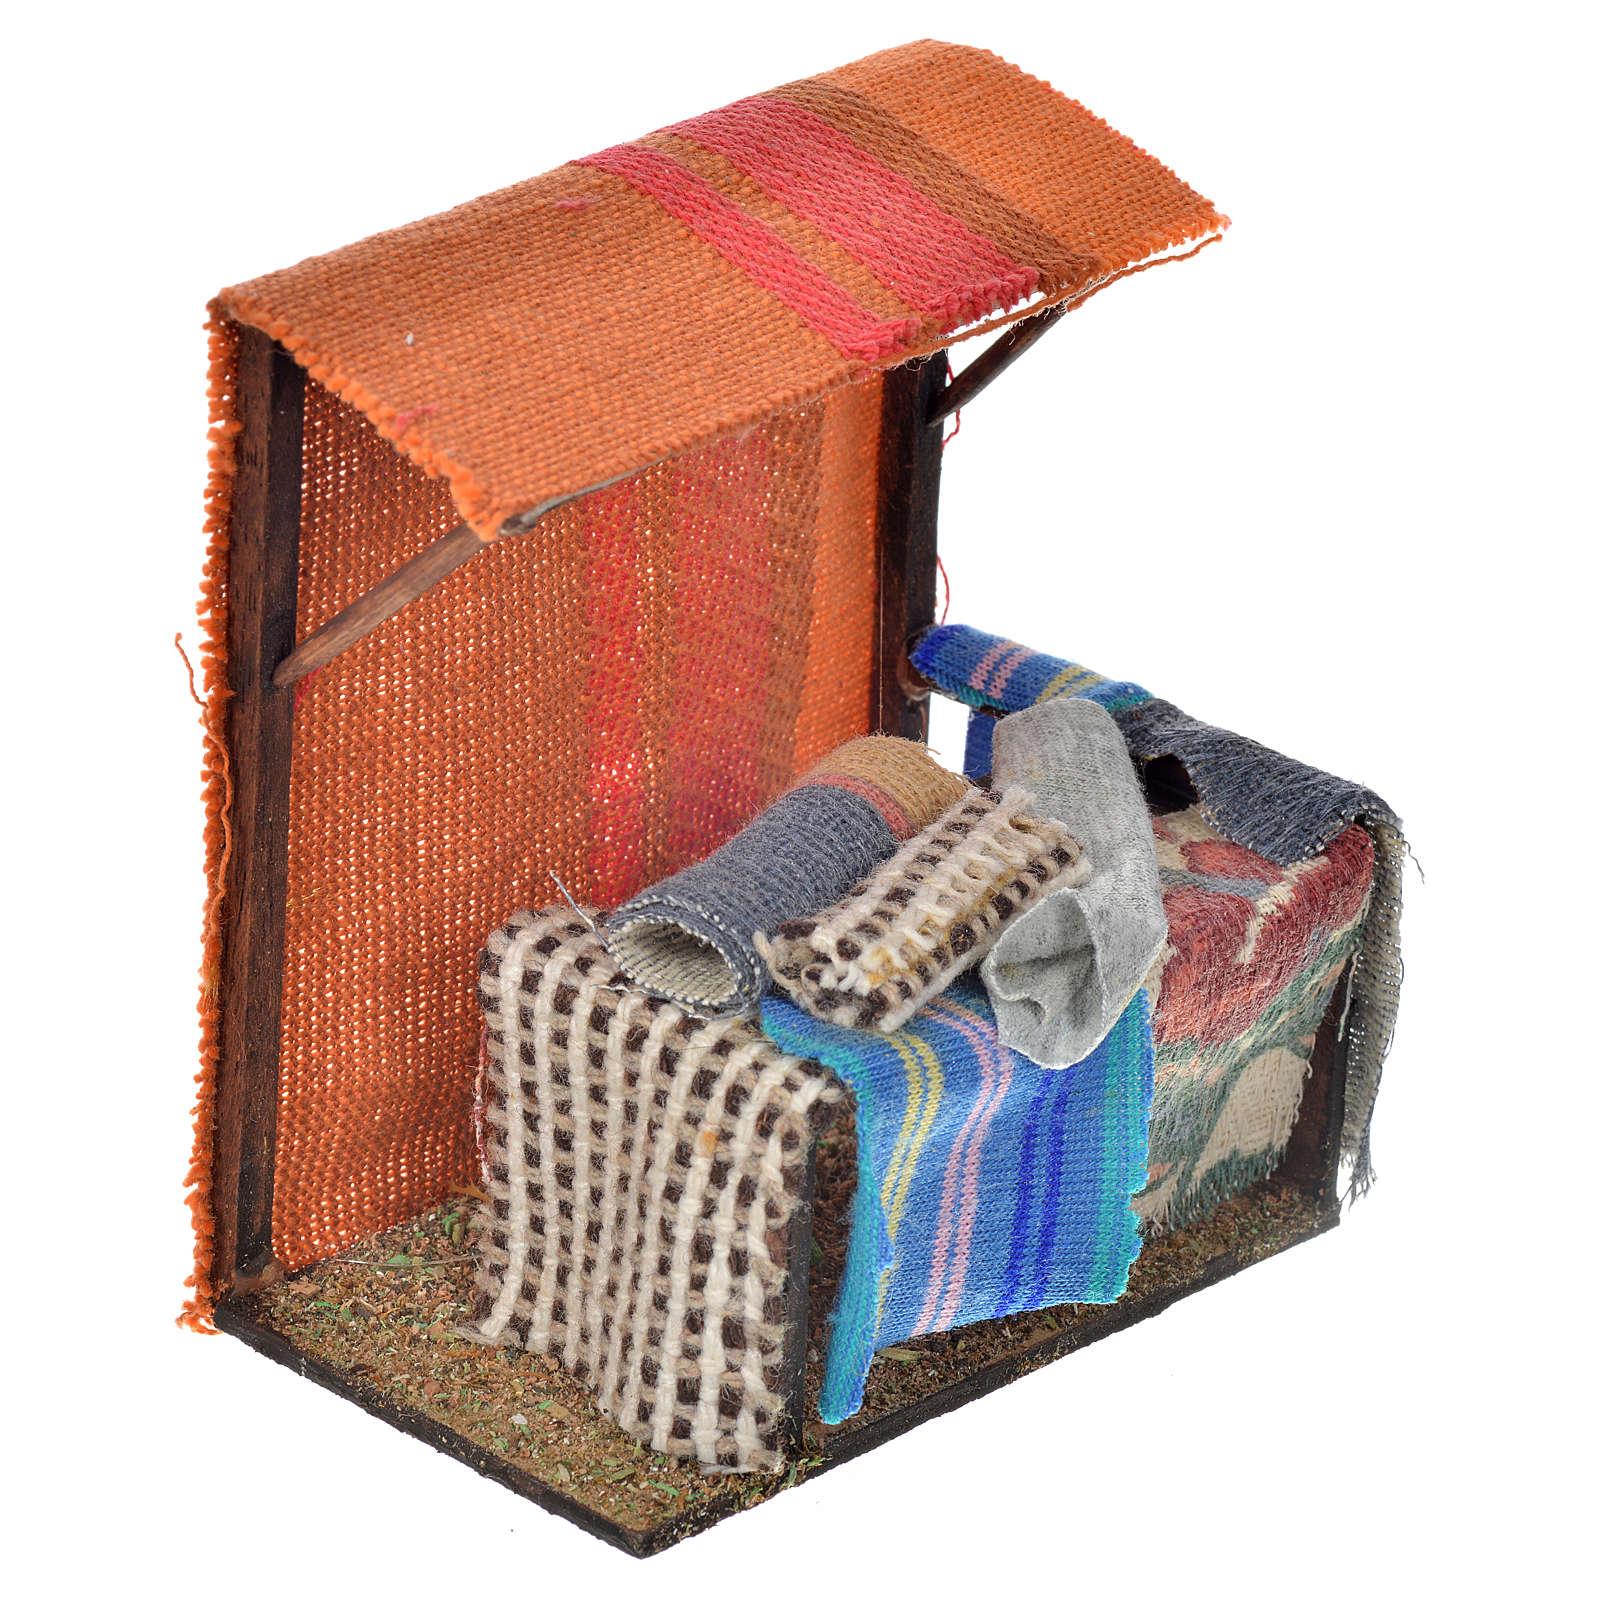 Banca de alfombras 10x10x7 pesebre napolitano 4